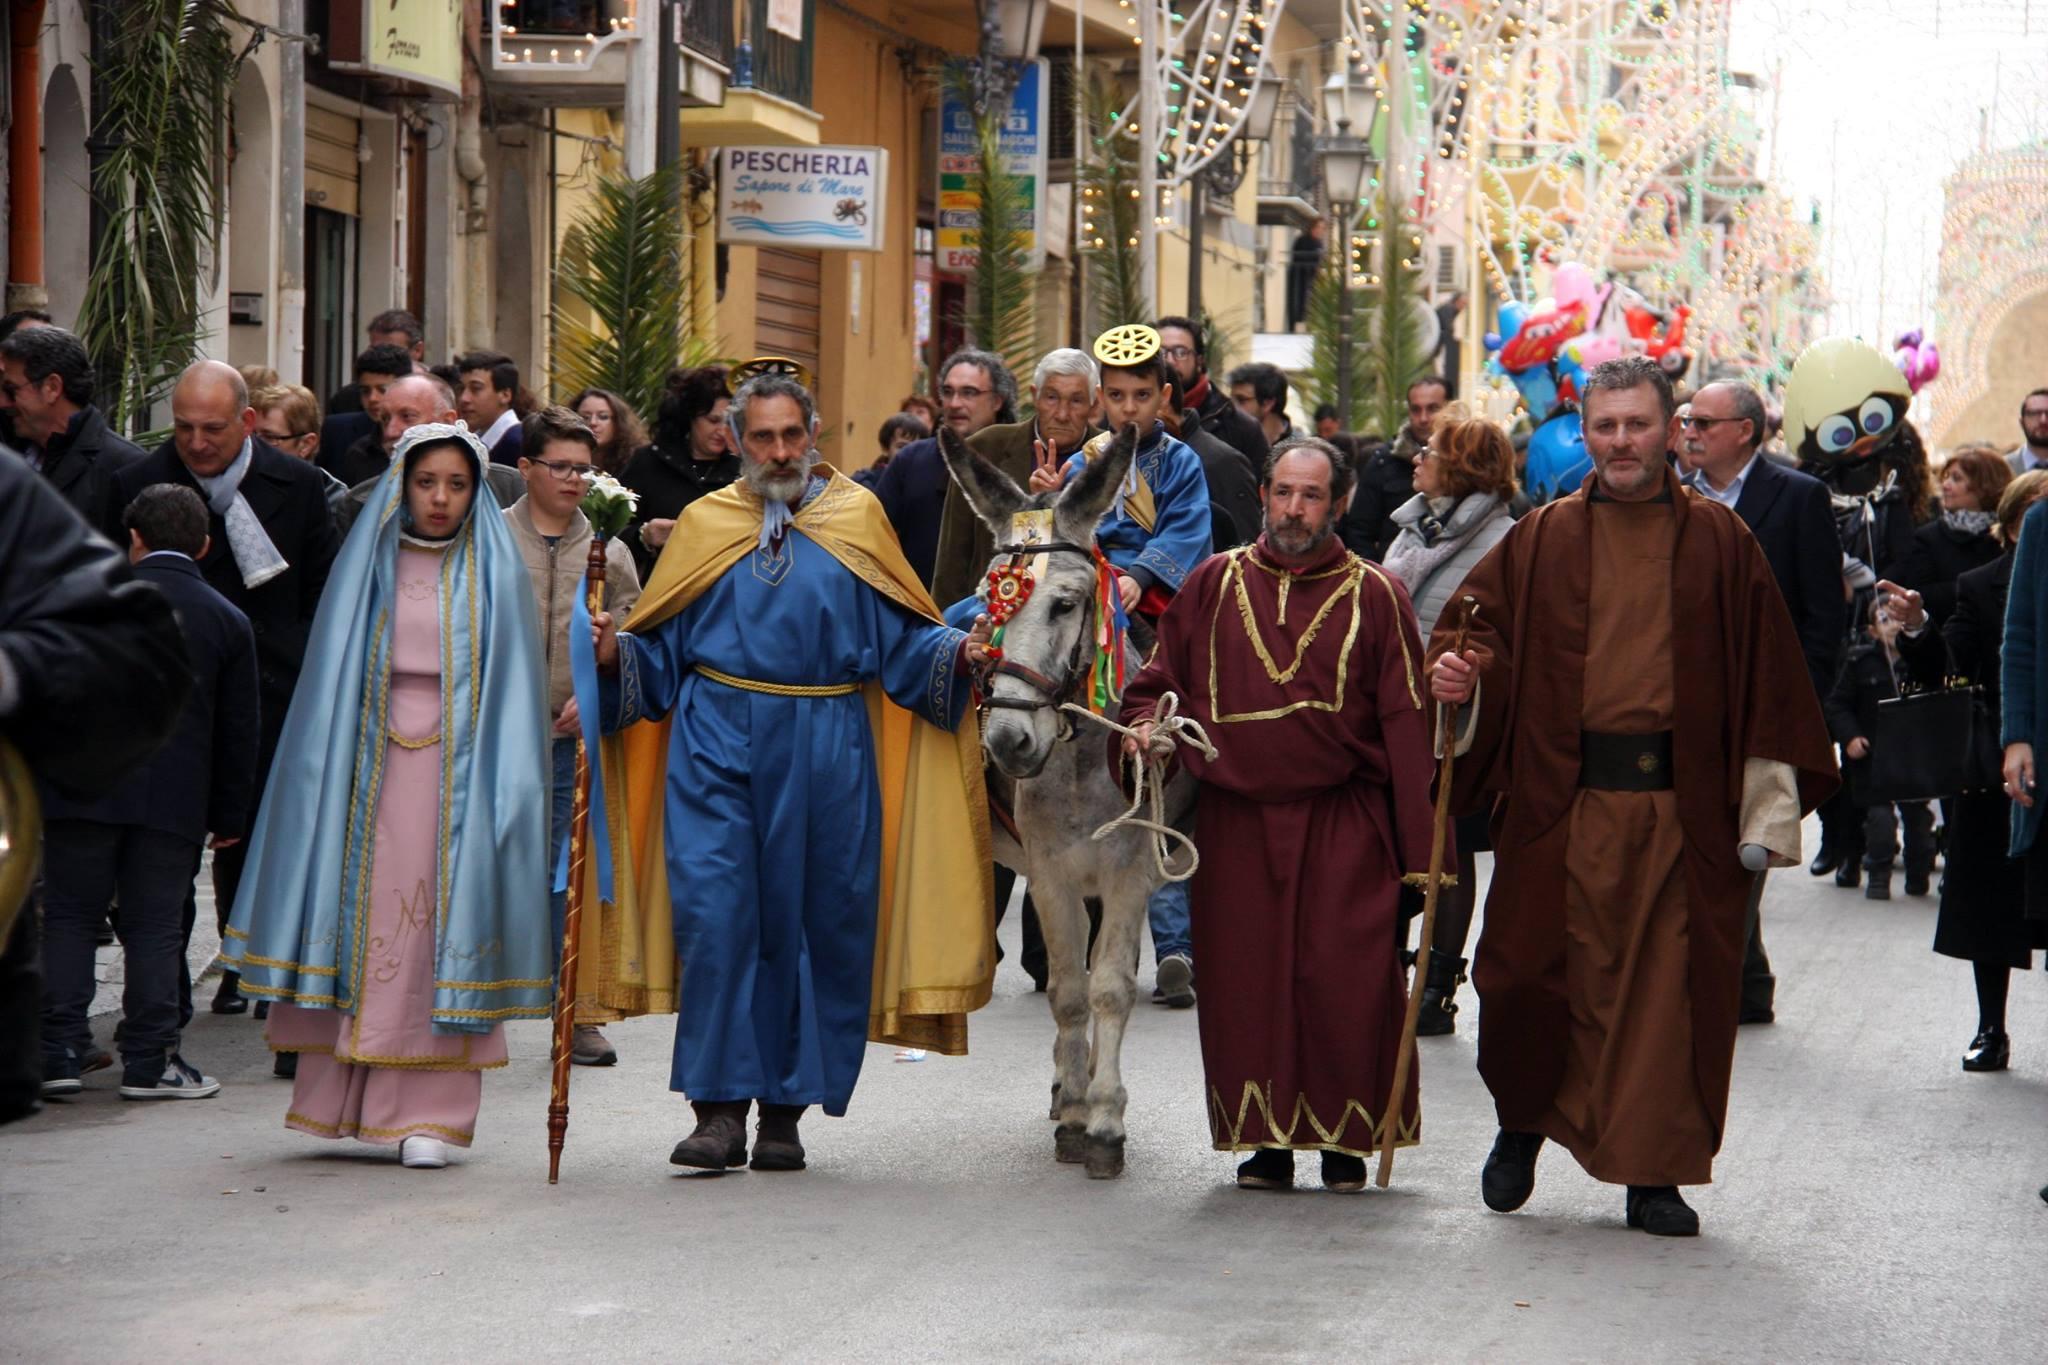 Festa di San Giuseppe 2015: le foto